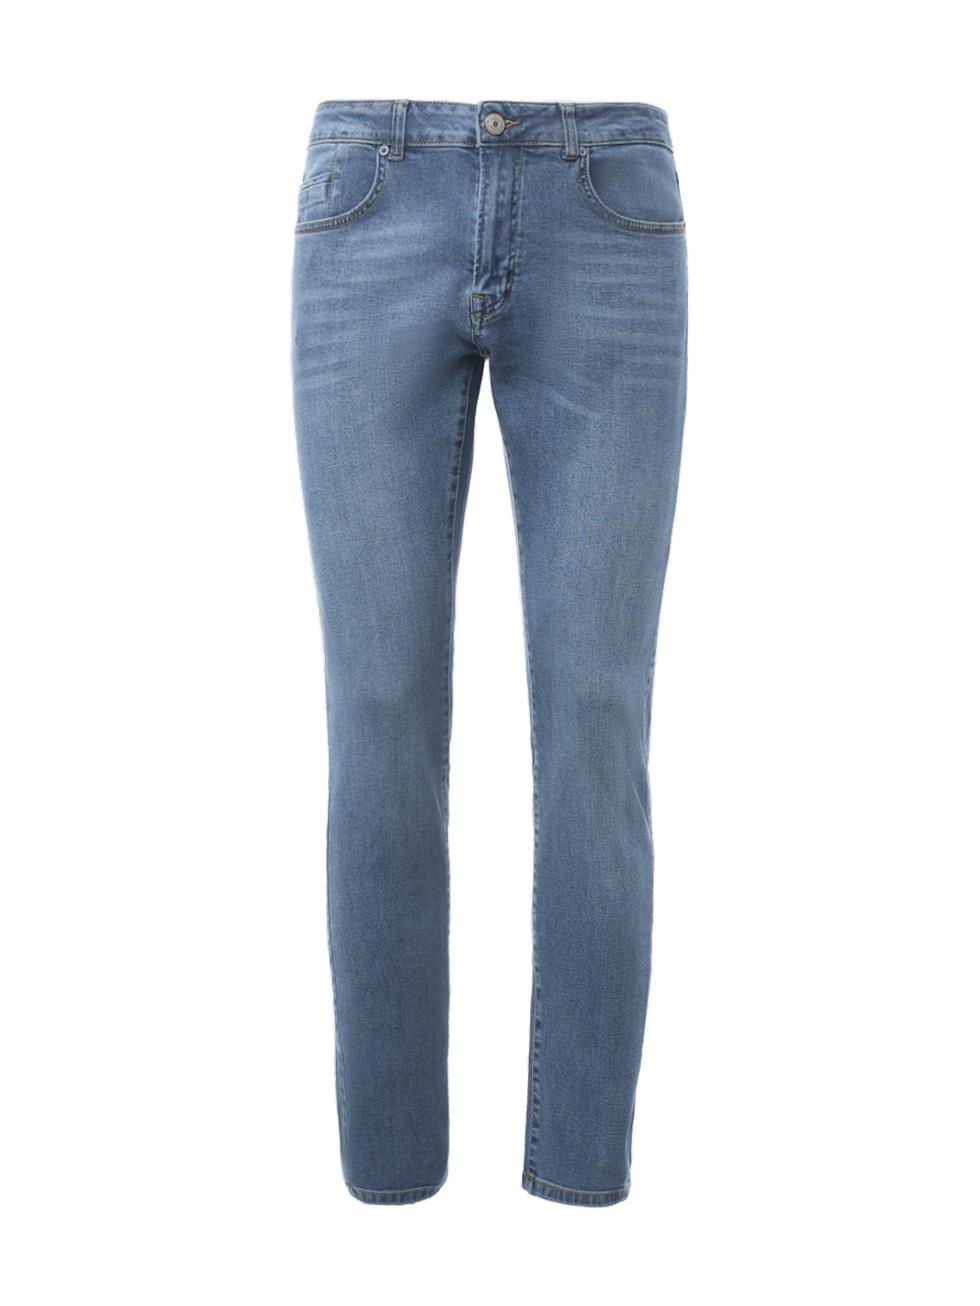 Jeans marino